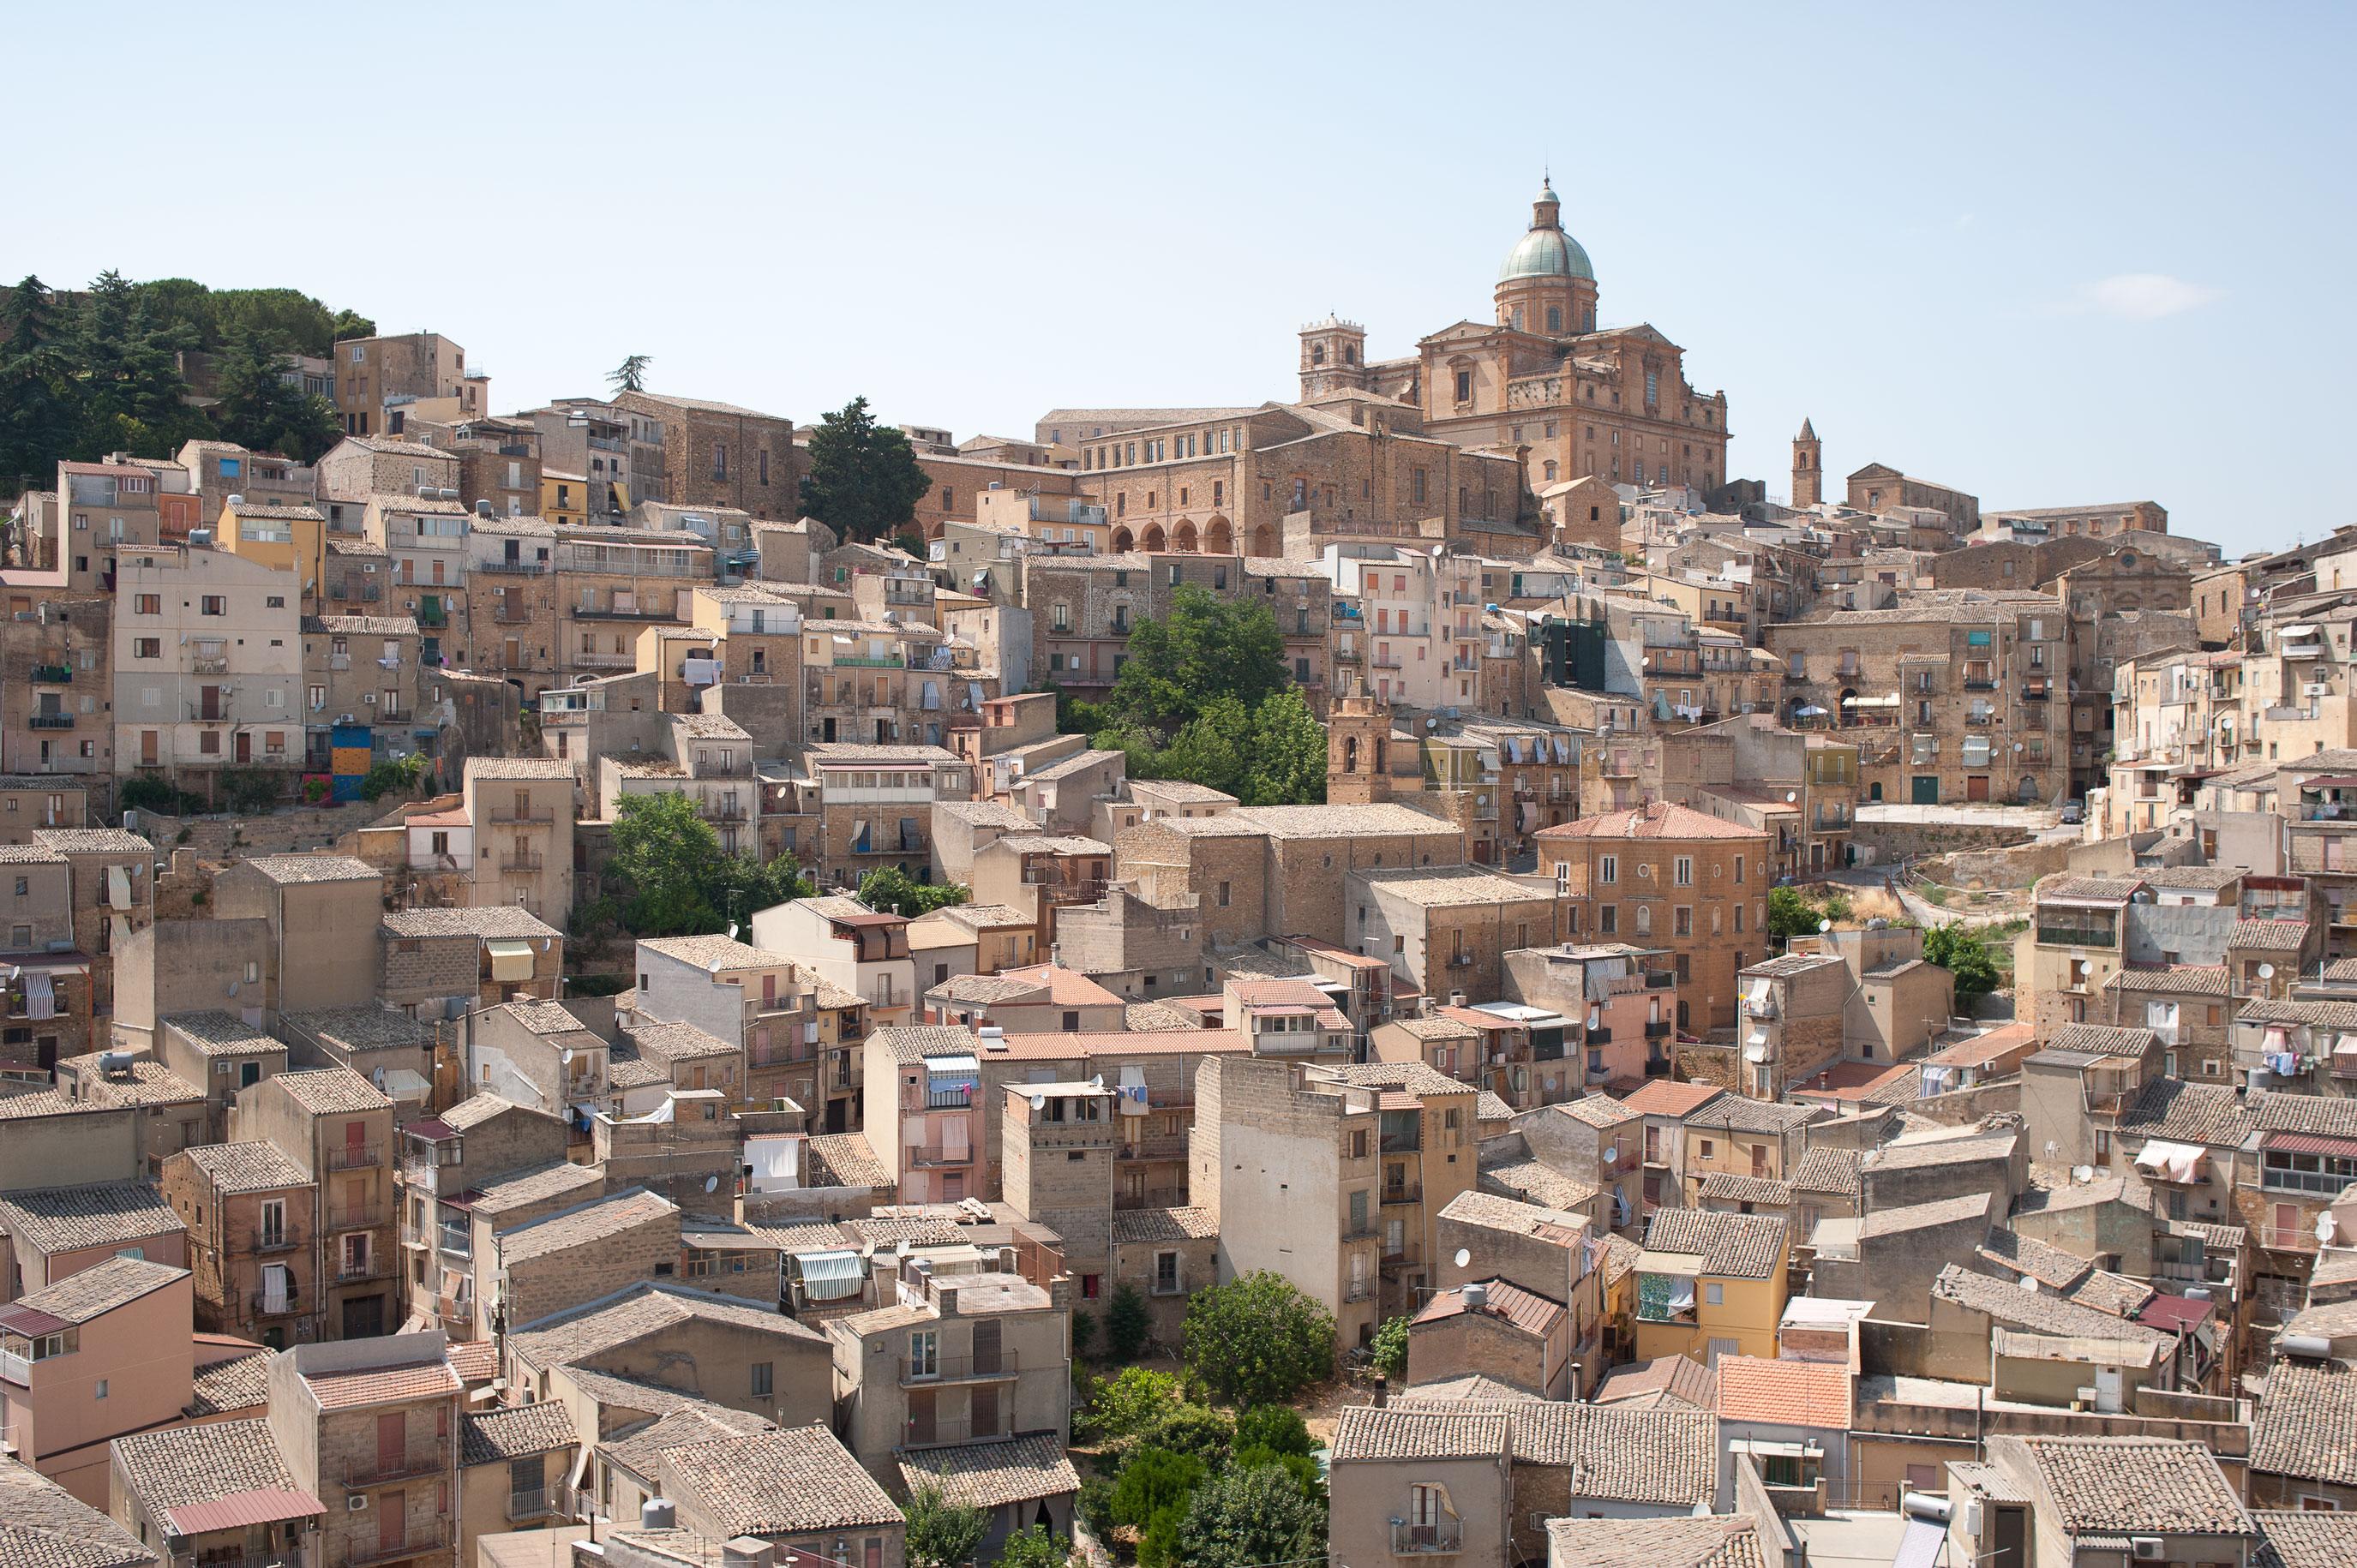 13_Sicily_Piazza_Armerina_Town_3451